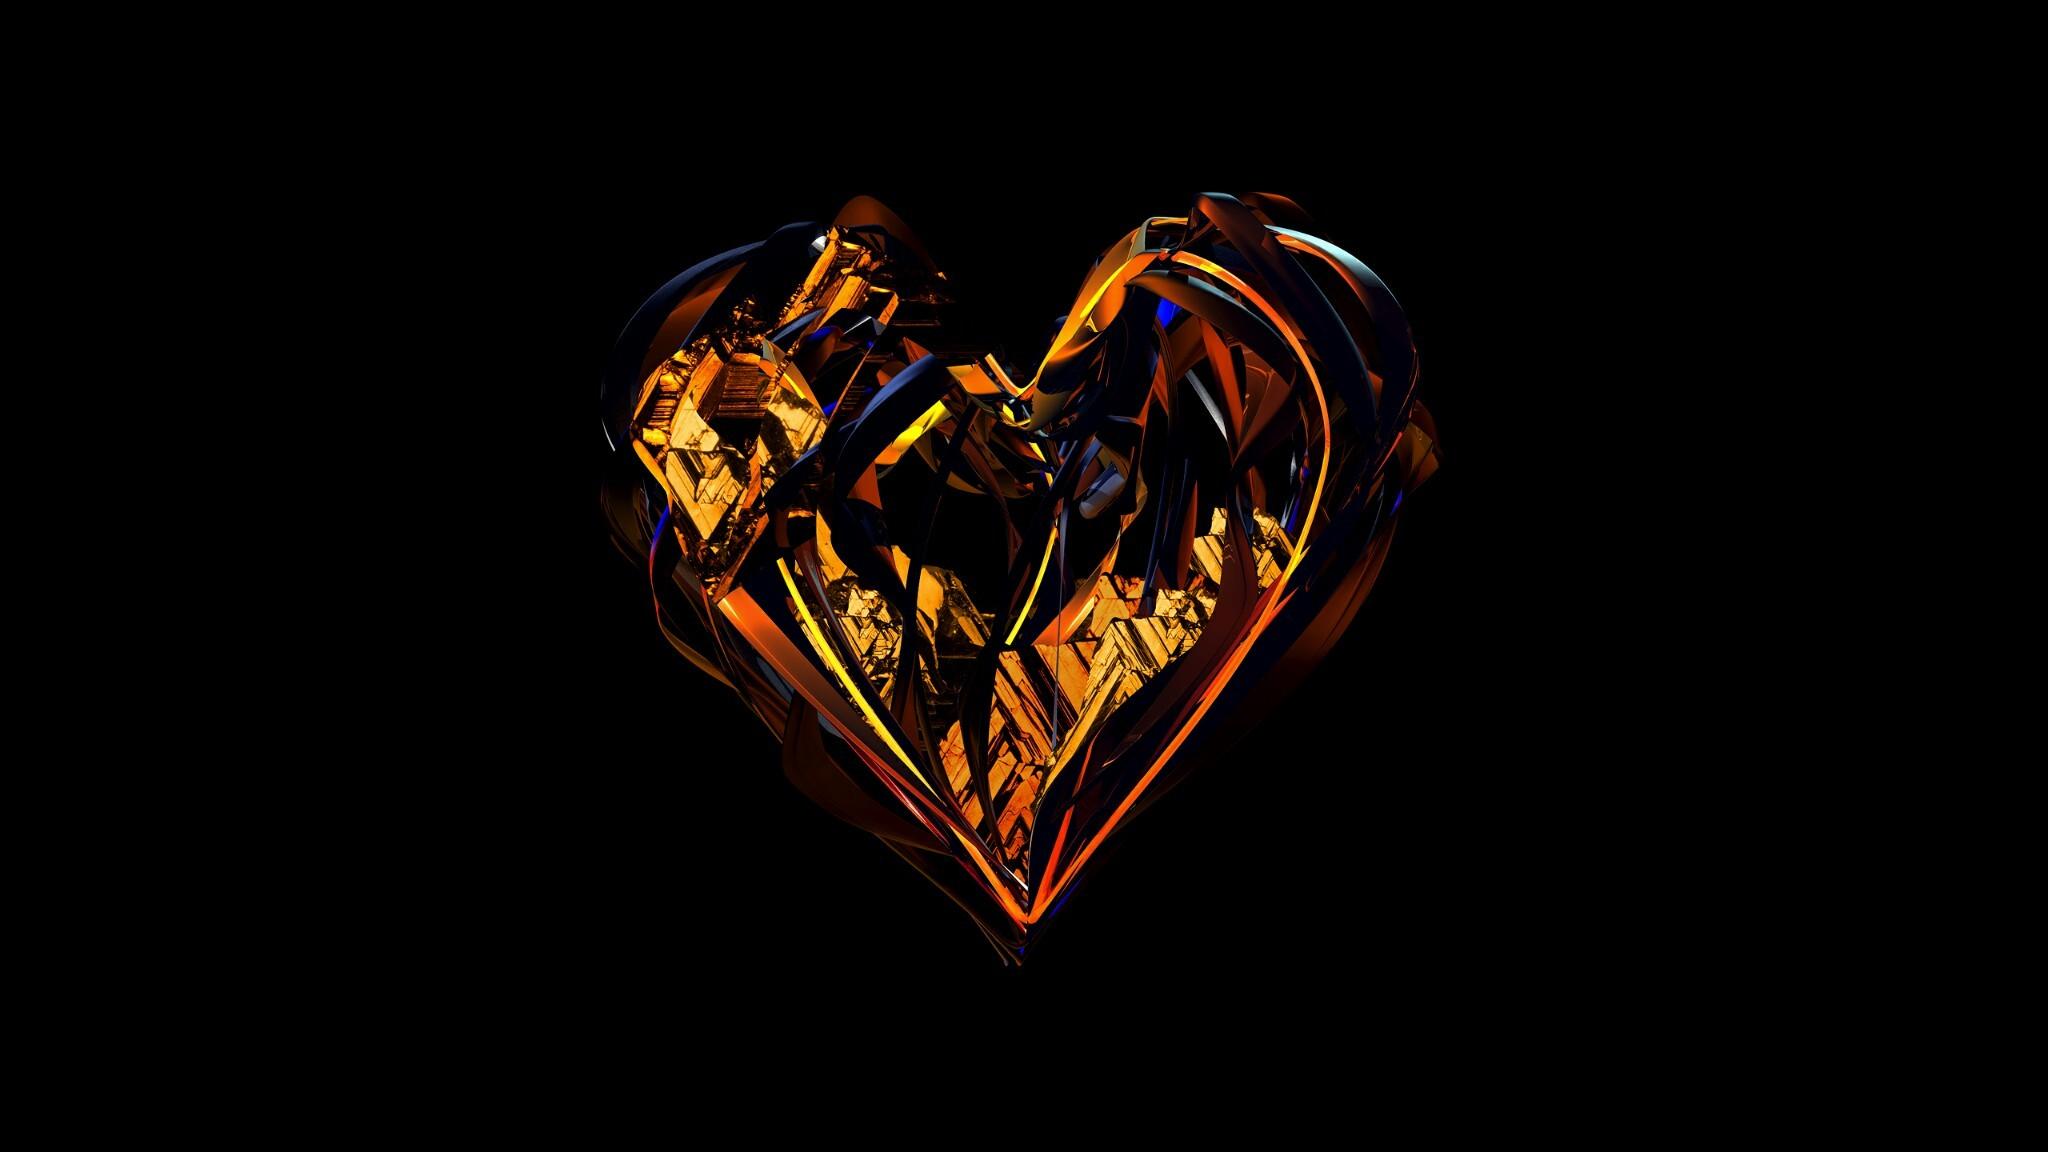 Wallpaper Illustration Heart Darkness Jewellery